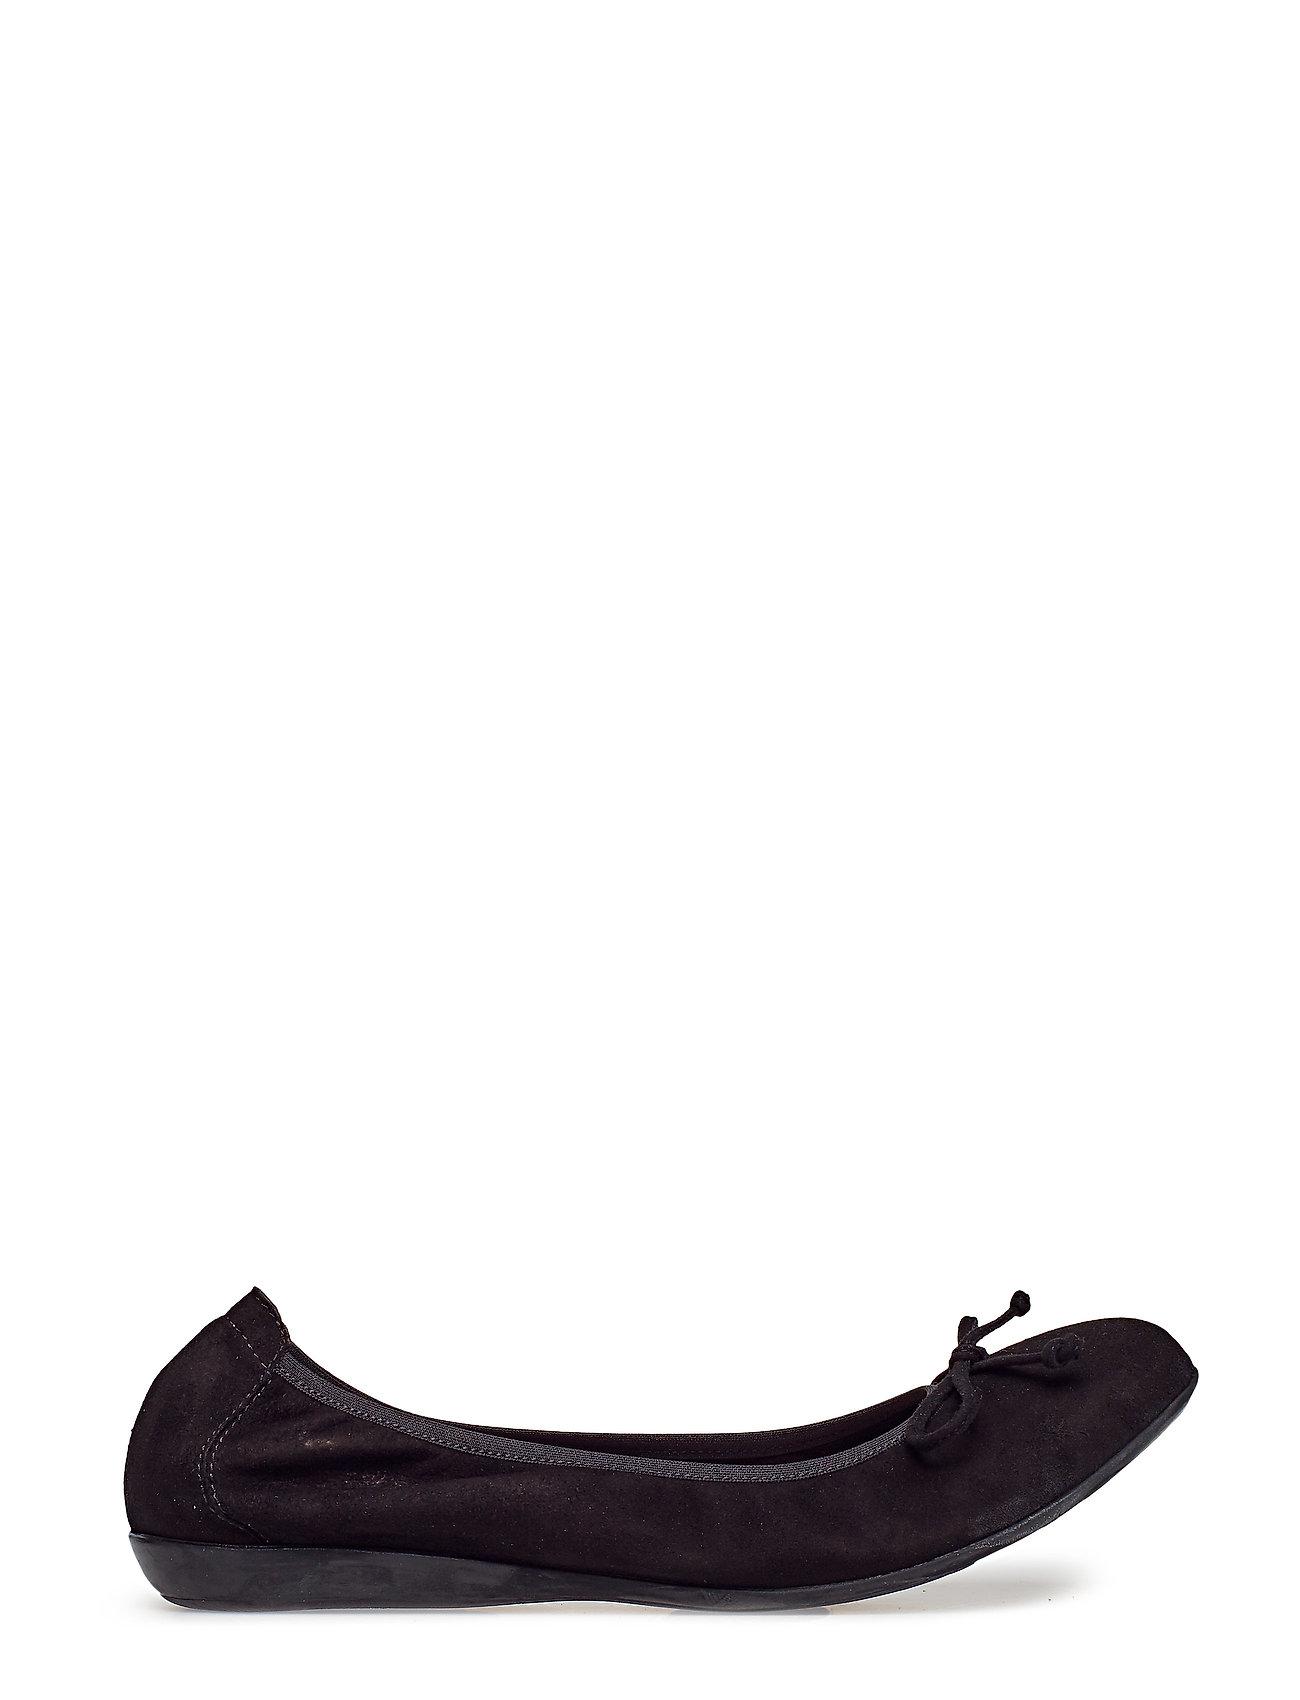 416f5751ea8 Wonders ballerina sko – A-6152 til dame i Lilla - Pashion.dk